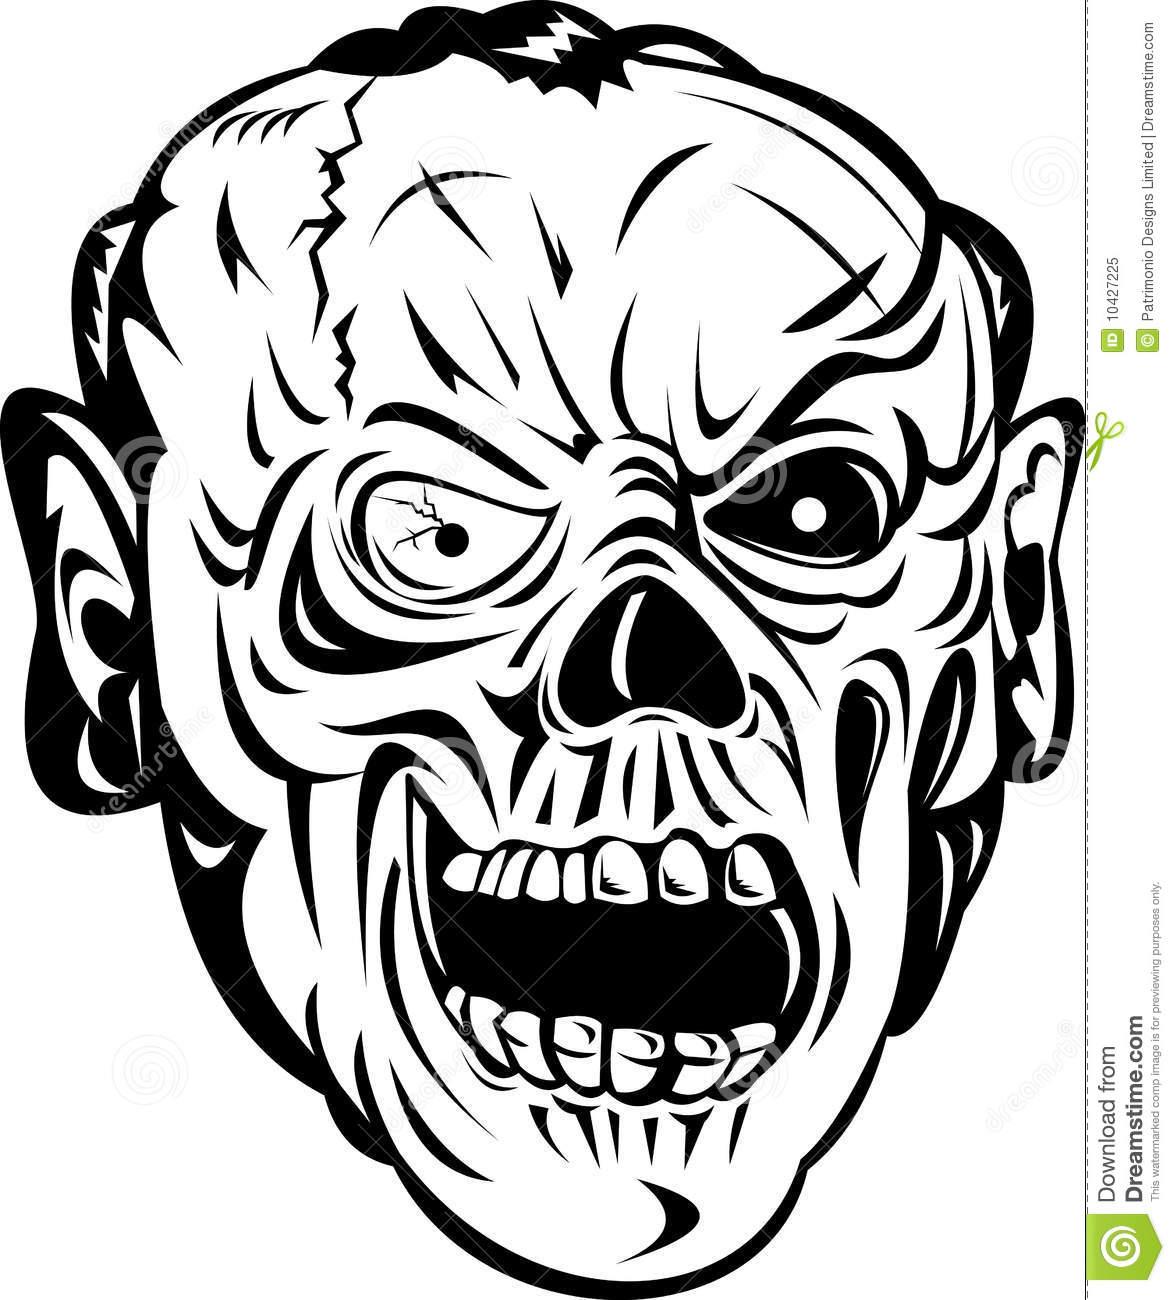 Zombie skull bone face stock vector. Illustration of black.